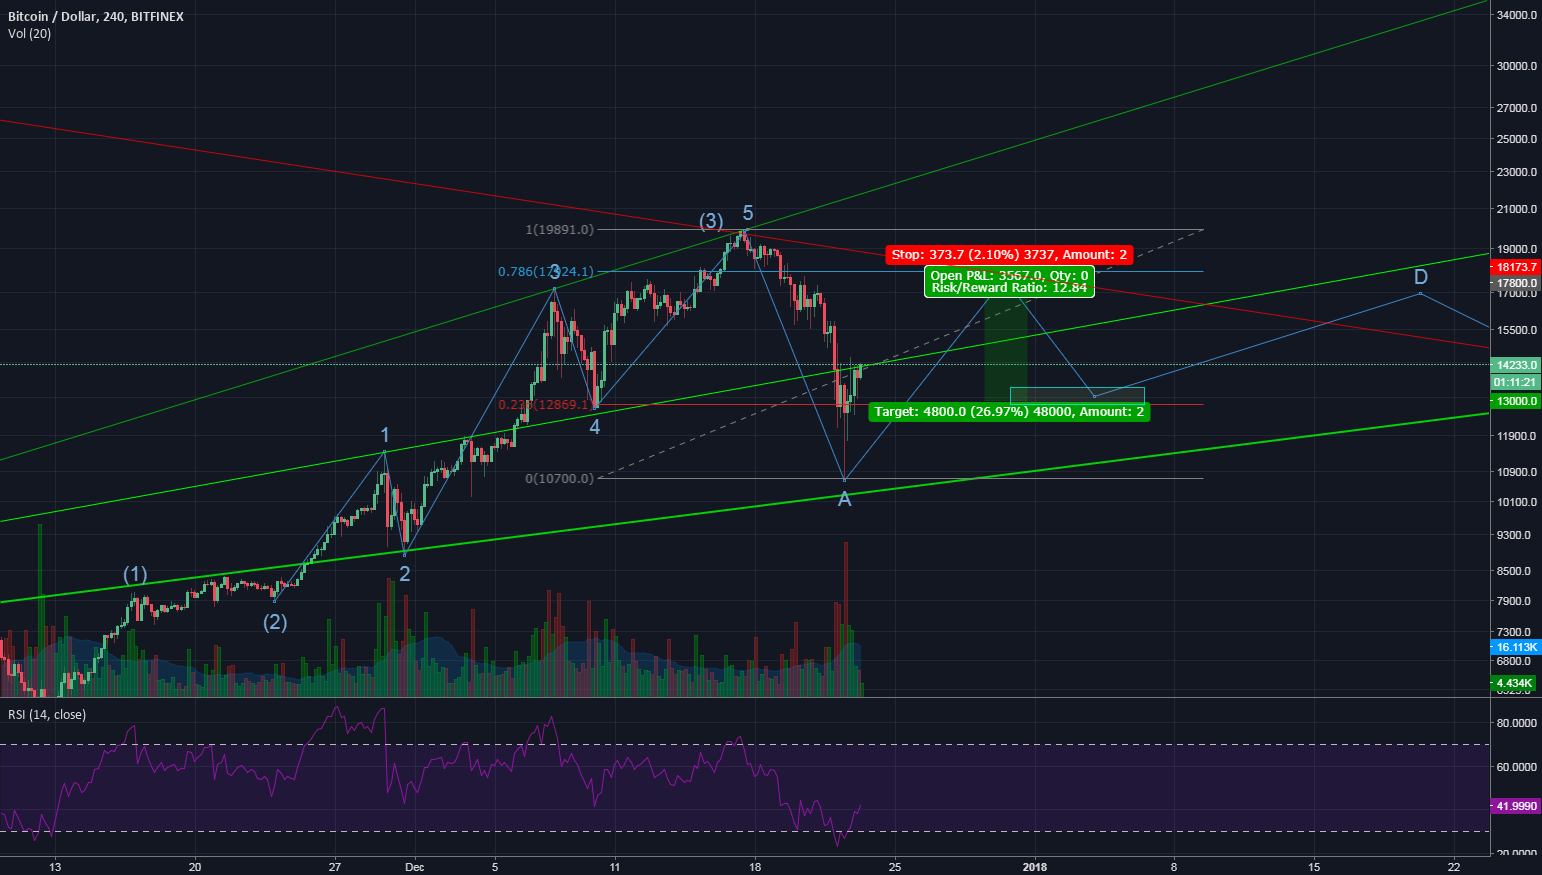 BTCUSD. Elliot Waves correction pattern. C wave short idea.